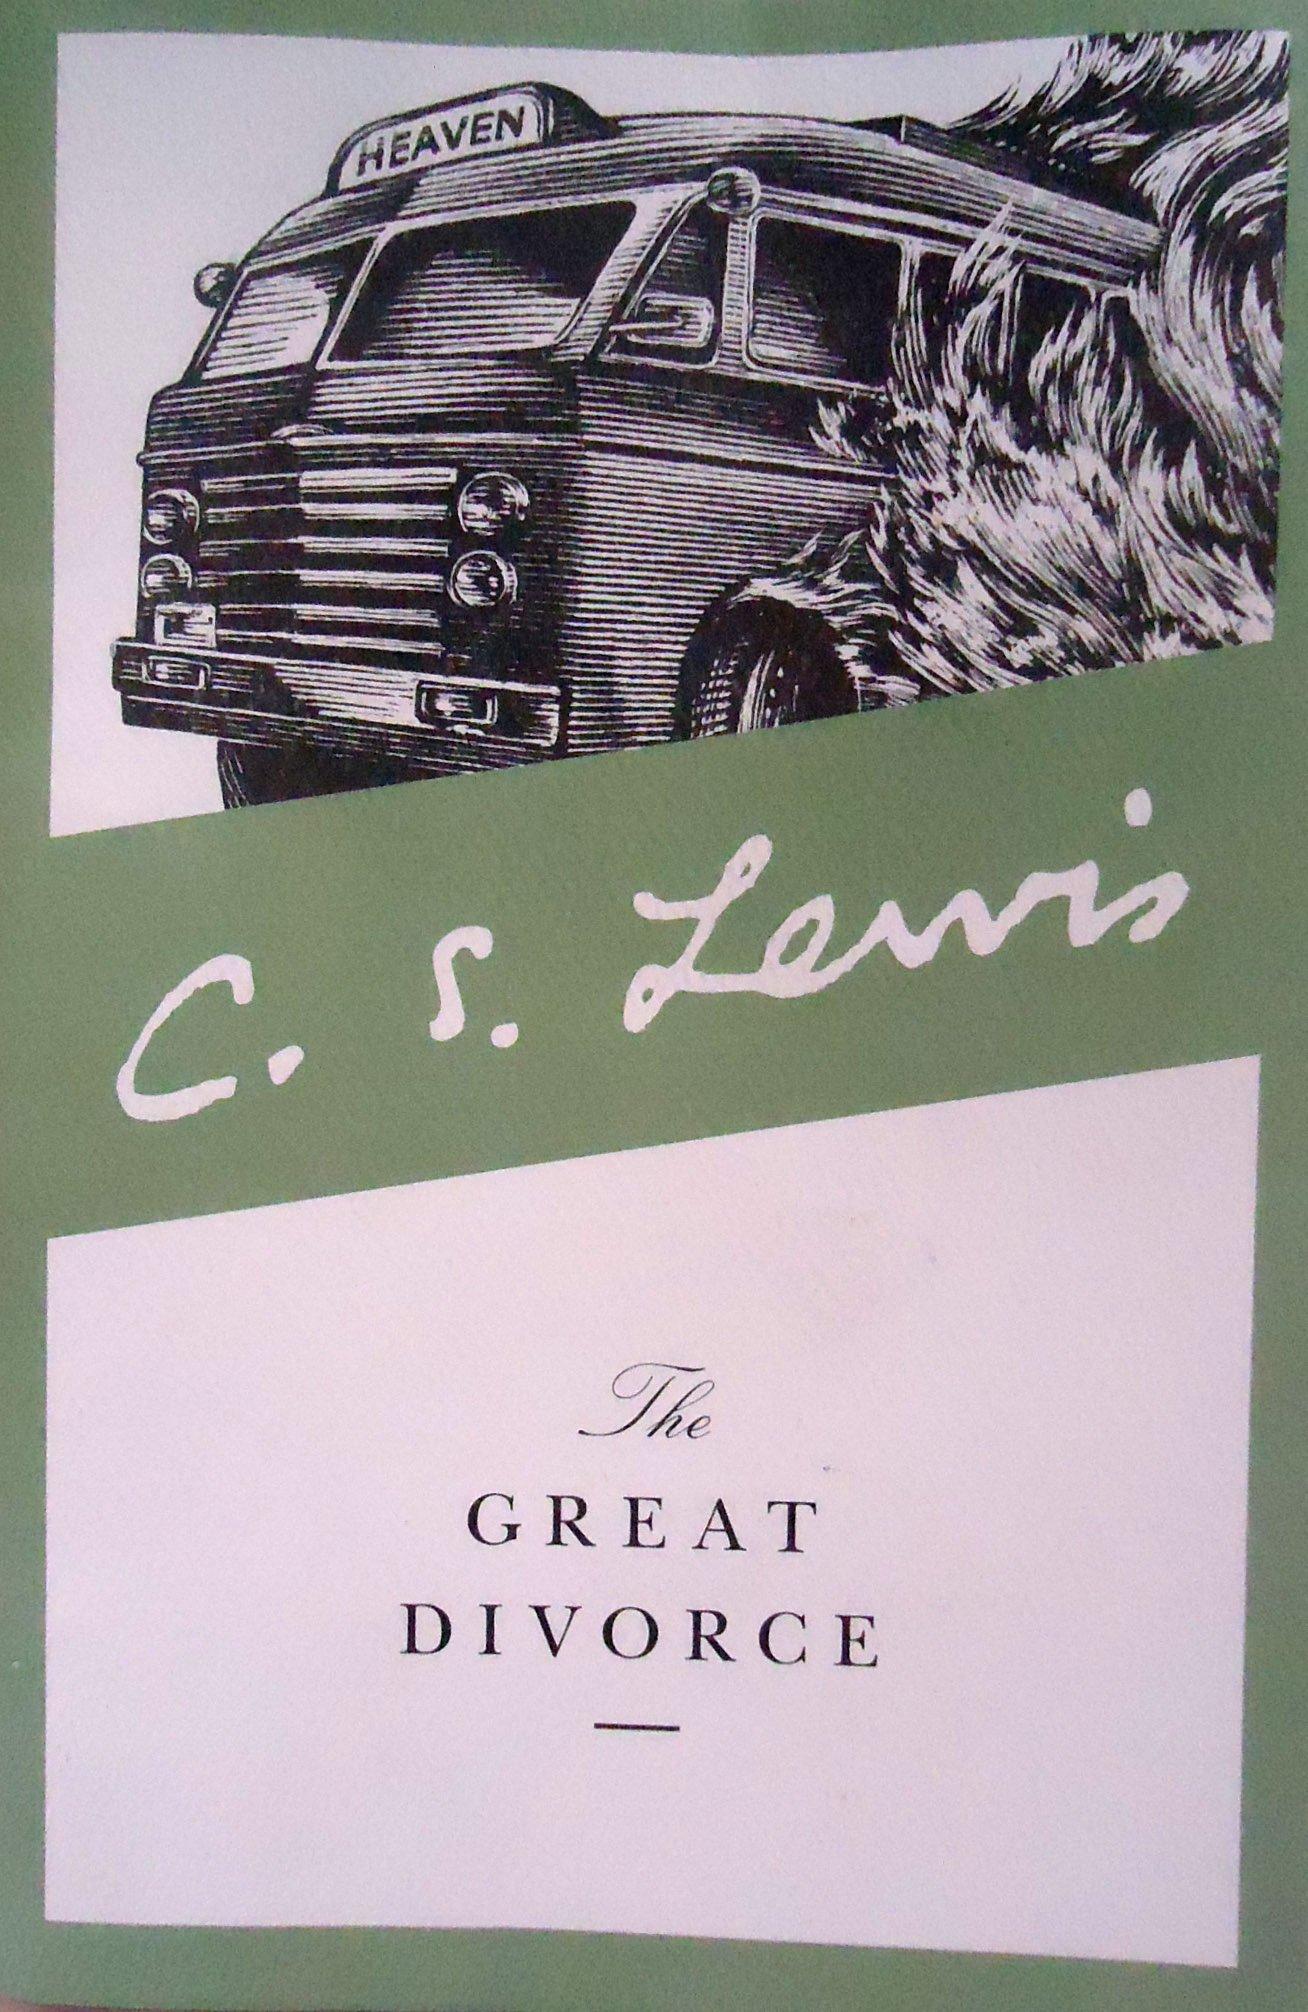 CS LEWIS THE GREAT DIVORCE EBOOK